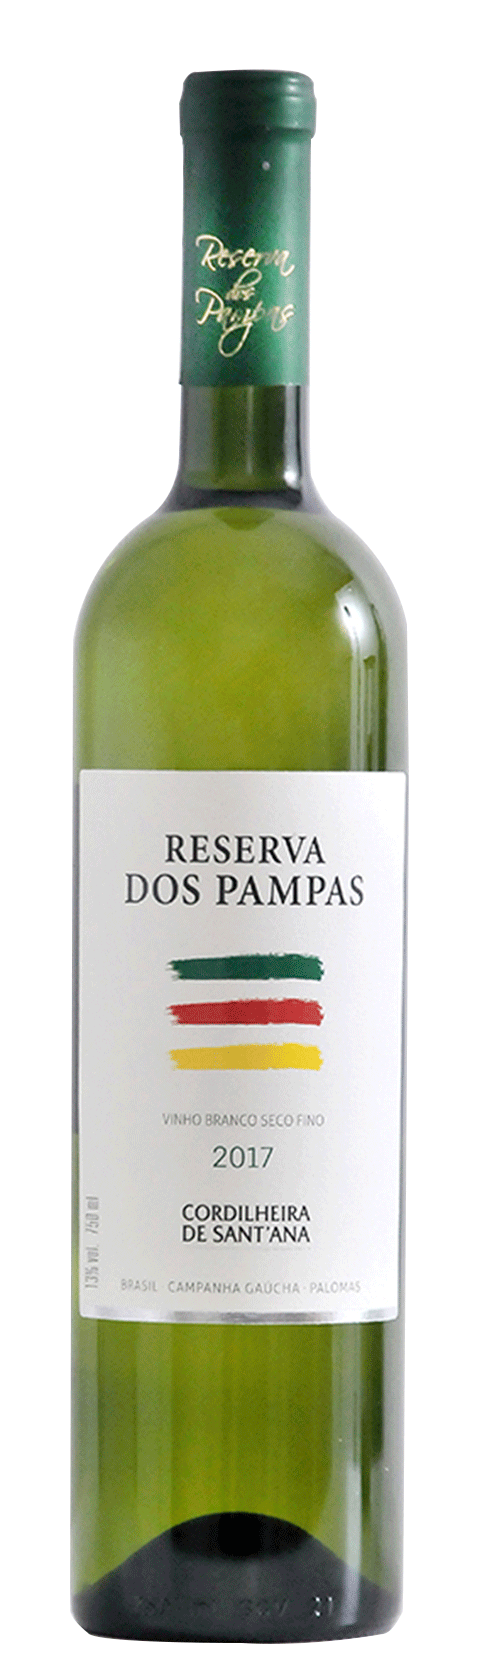 Reserva dos Pampas Branco 2017